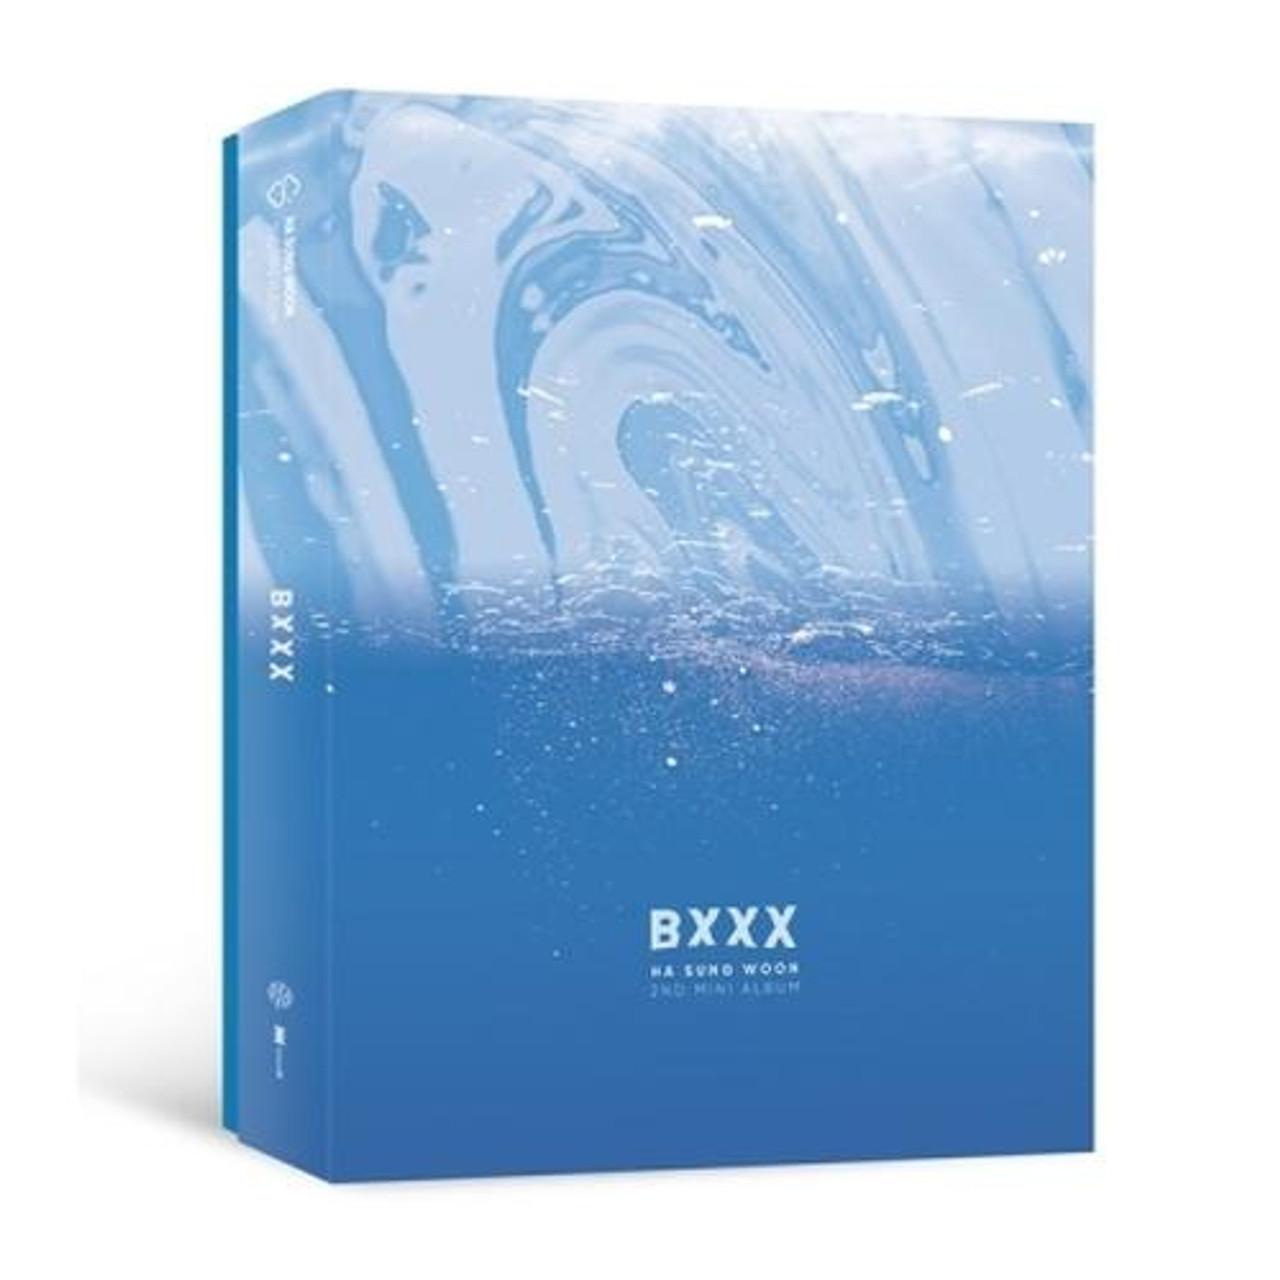 Ha Sung Woon - 2nd Mini [BXXX] + Poster